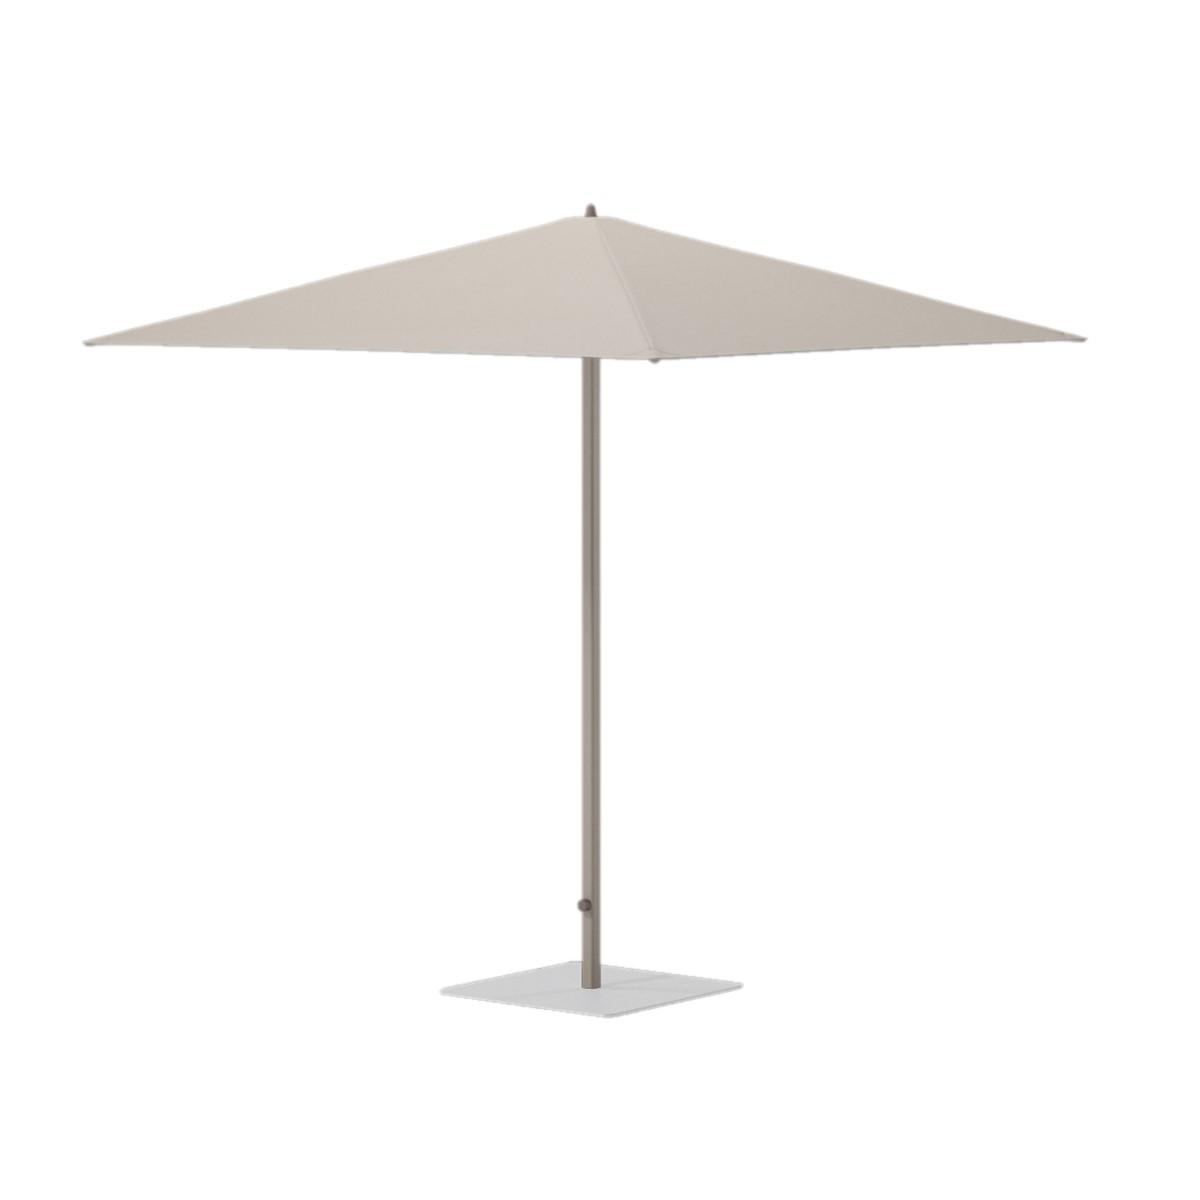 Product Image Meteo S Parasol